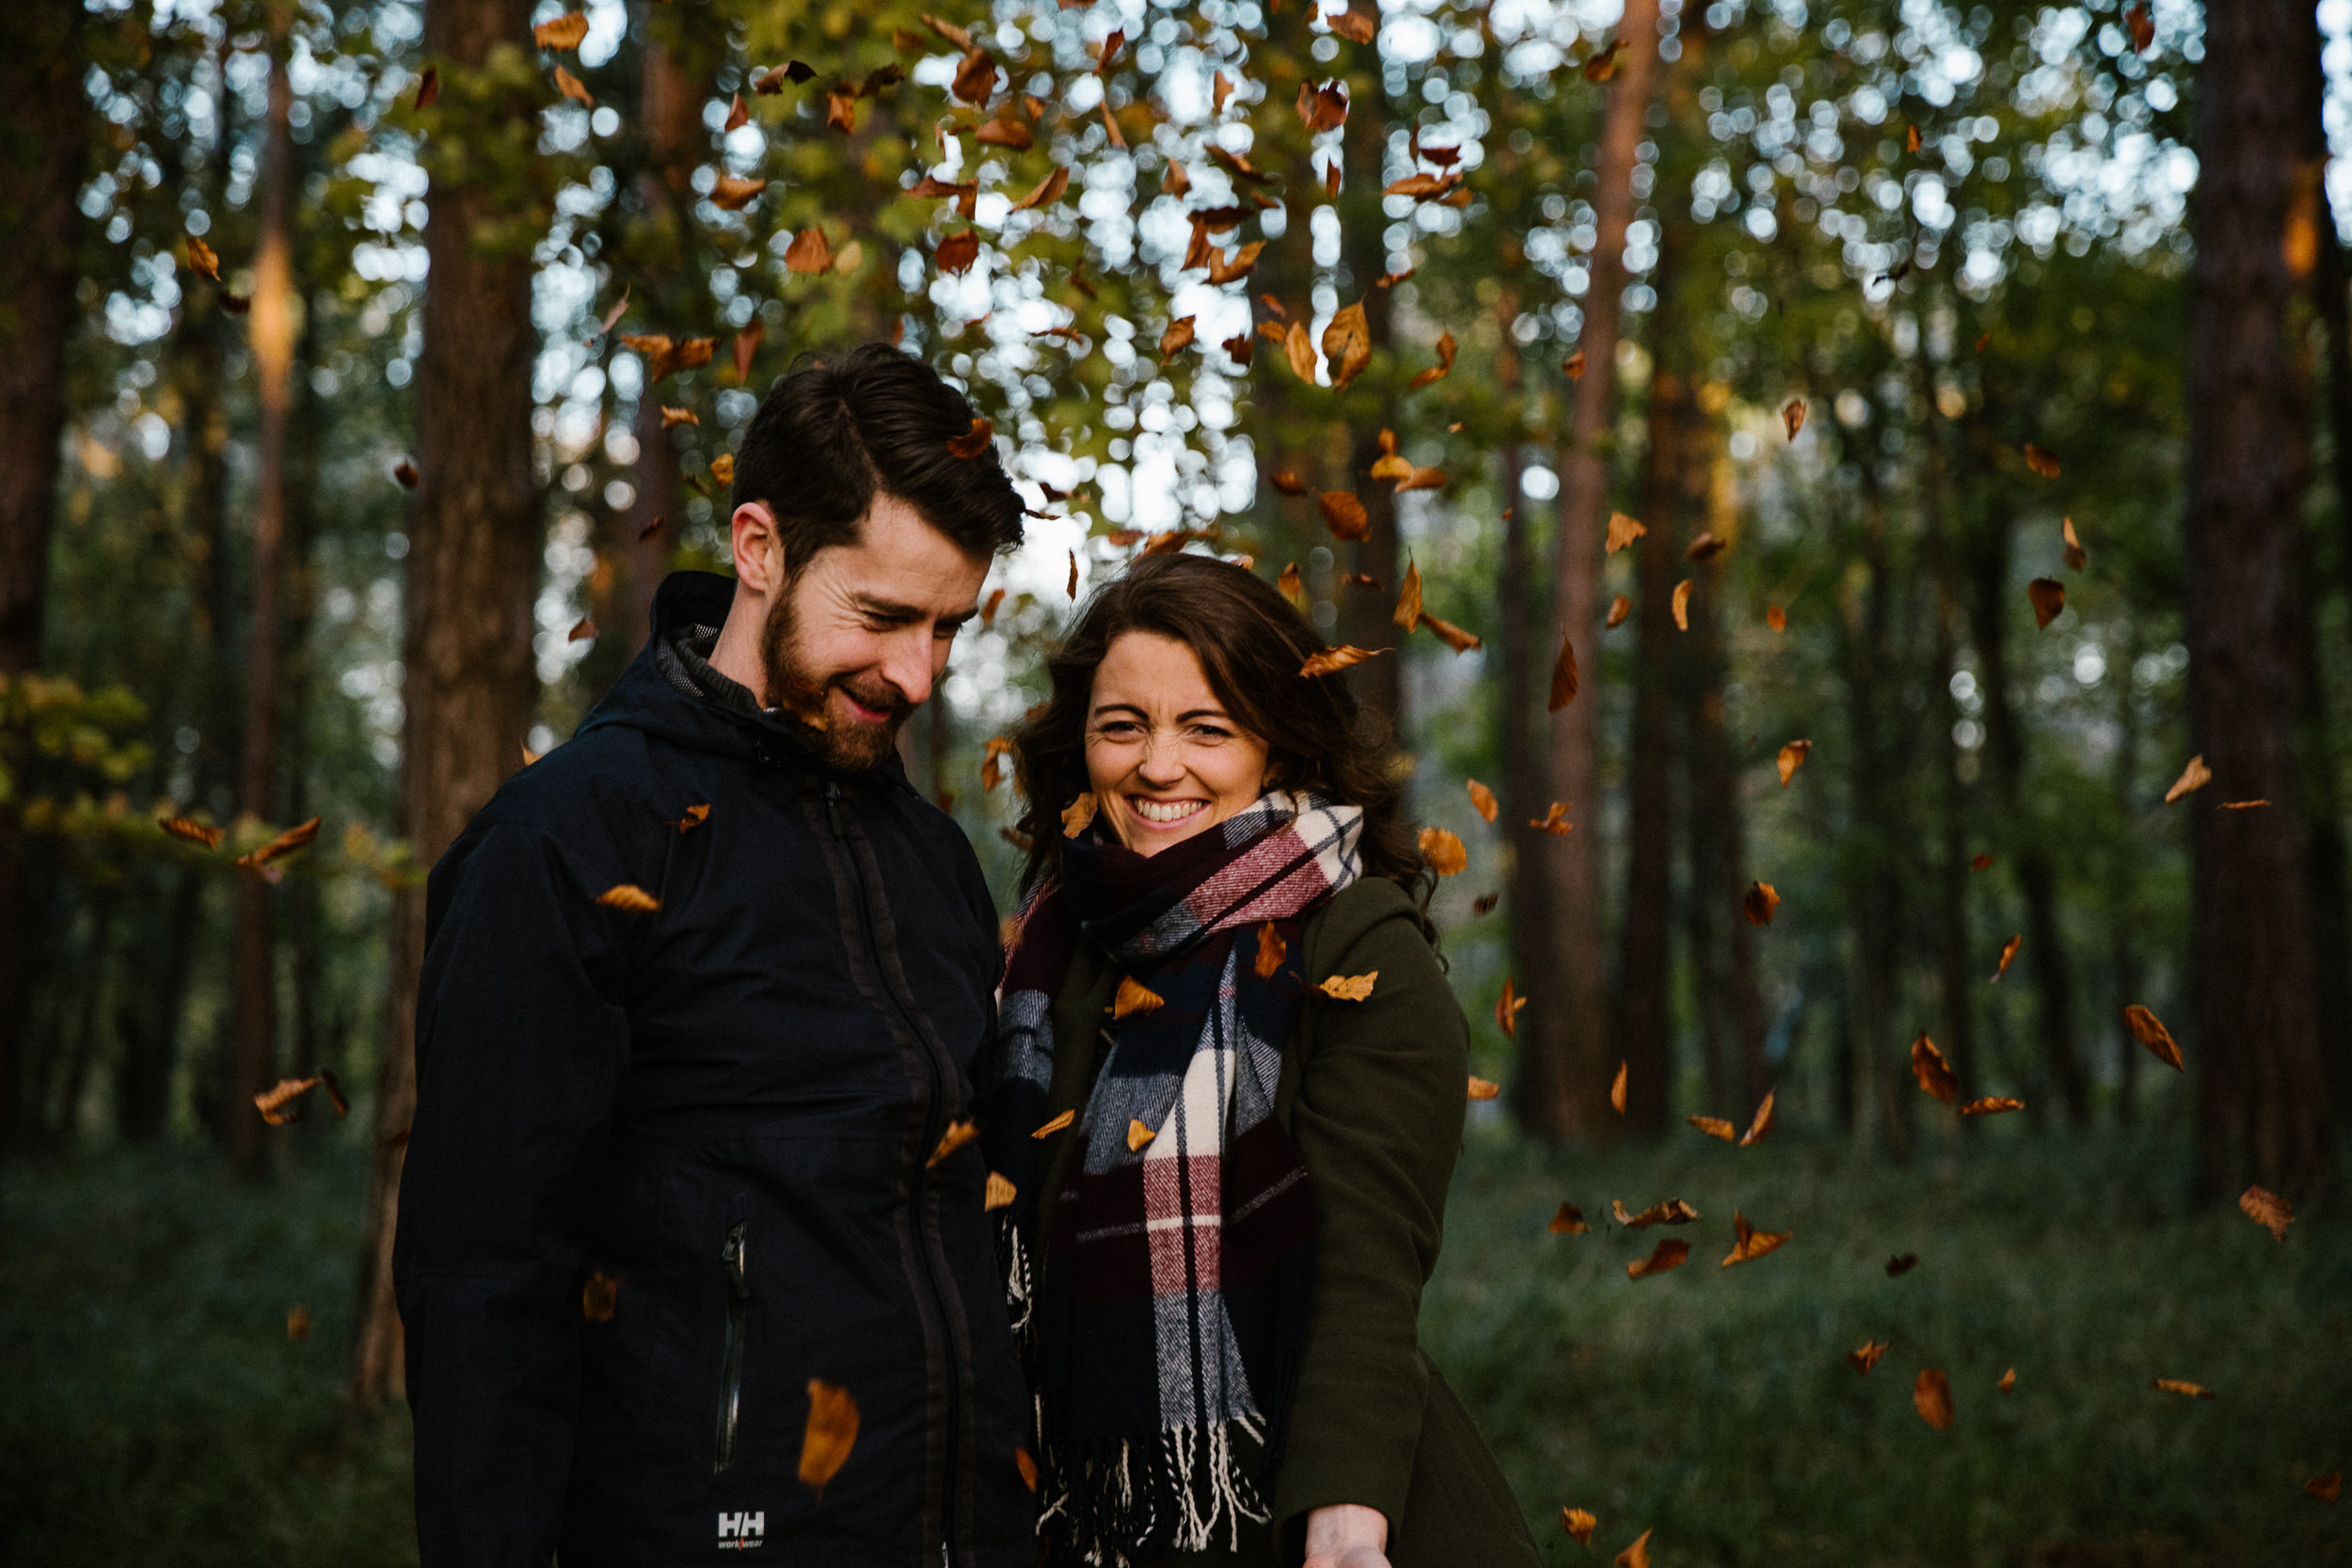 clairebyrnephotography-fun-wedding-photographer-ireland-creative-engagment-park-9.jpg